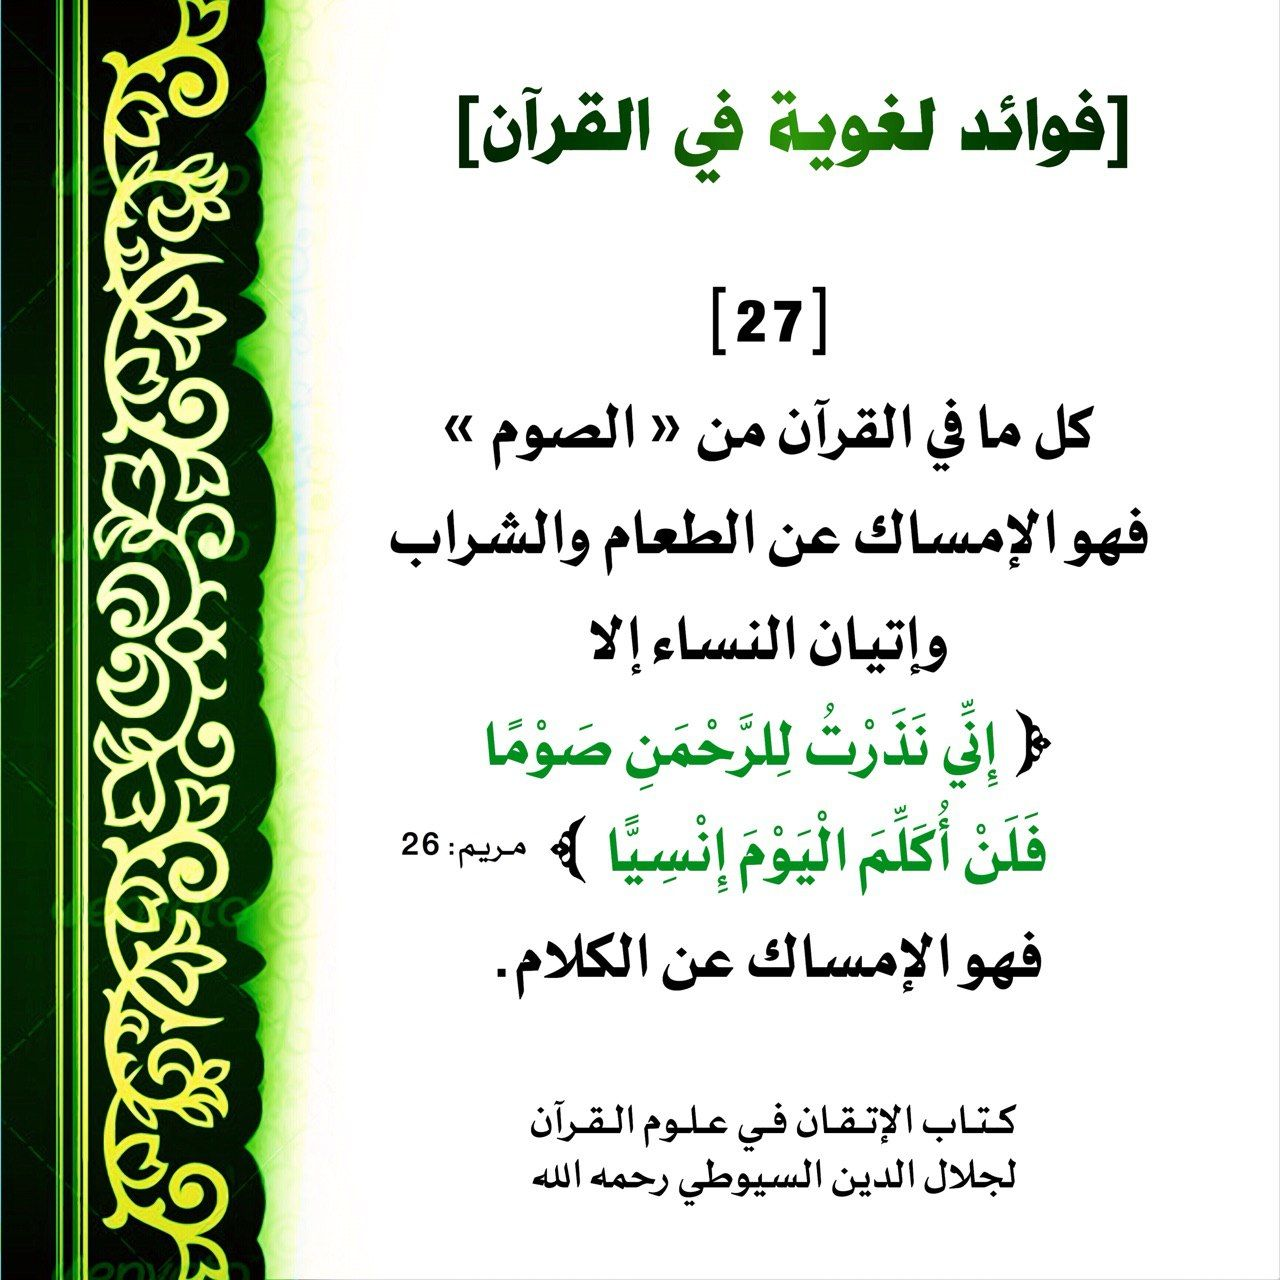 Pin By Faten Hadi On 04 4 Lbitq فوائد لغوية في القرآن Quran Verses Quran Tafseer Words